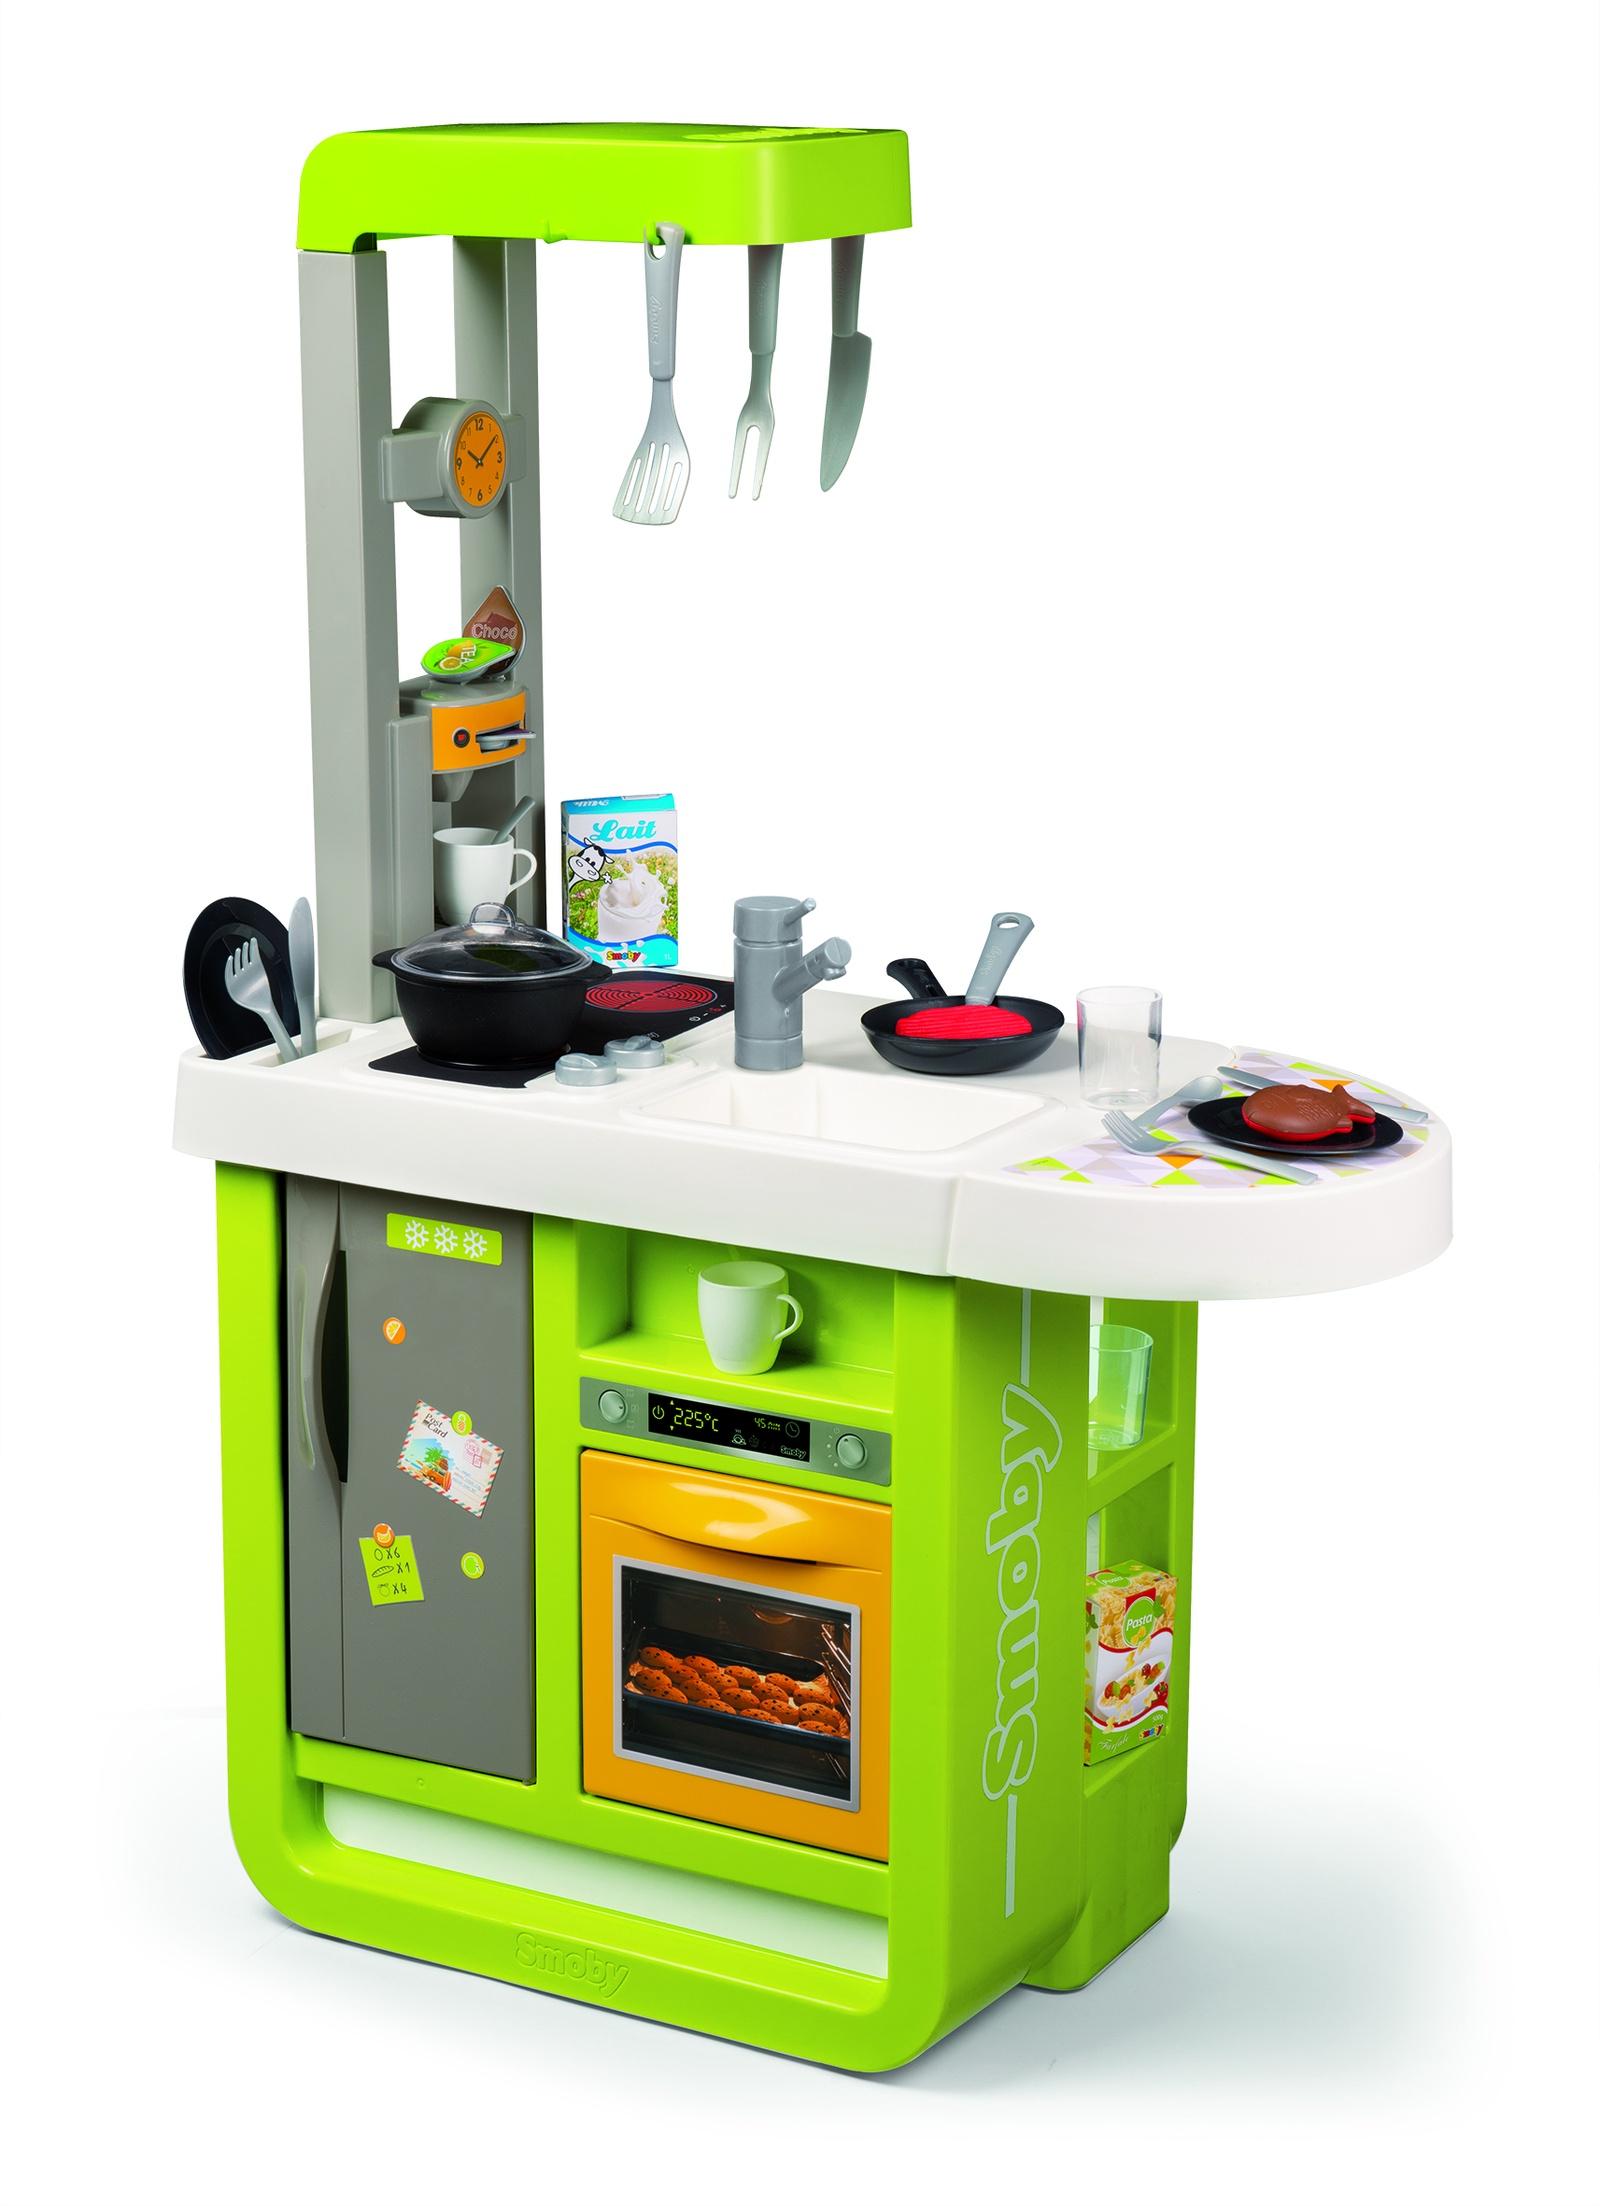 Кухня электронная Cherry, звук, 25 акс., 66,5х32х95,7 см smoby кухня электронная tefal super chef deluxe звук пузырьки 46 аксессуаров 311304